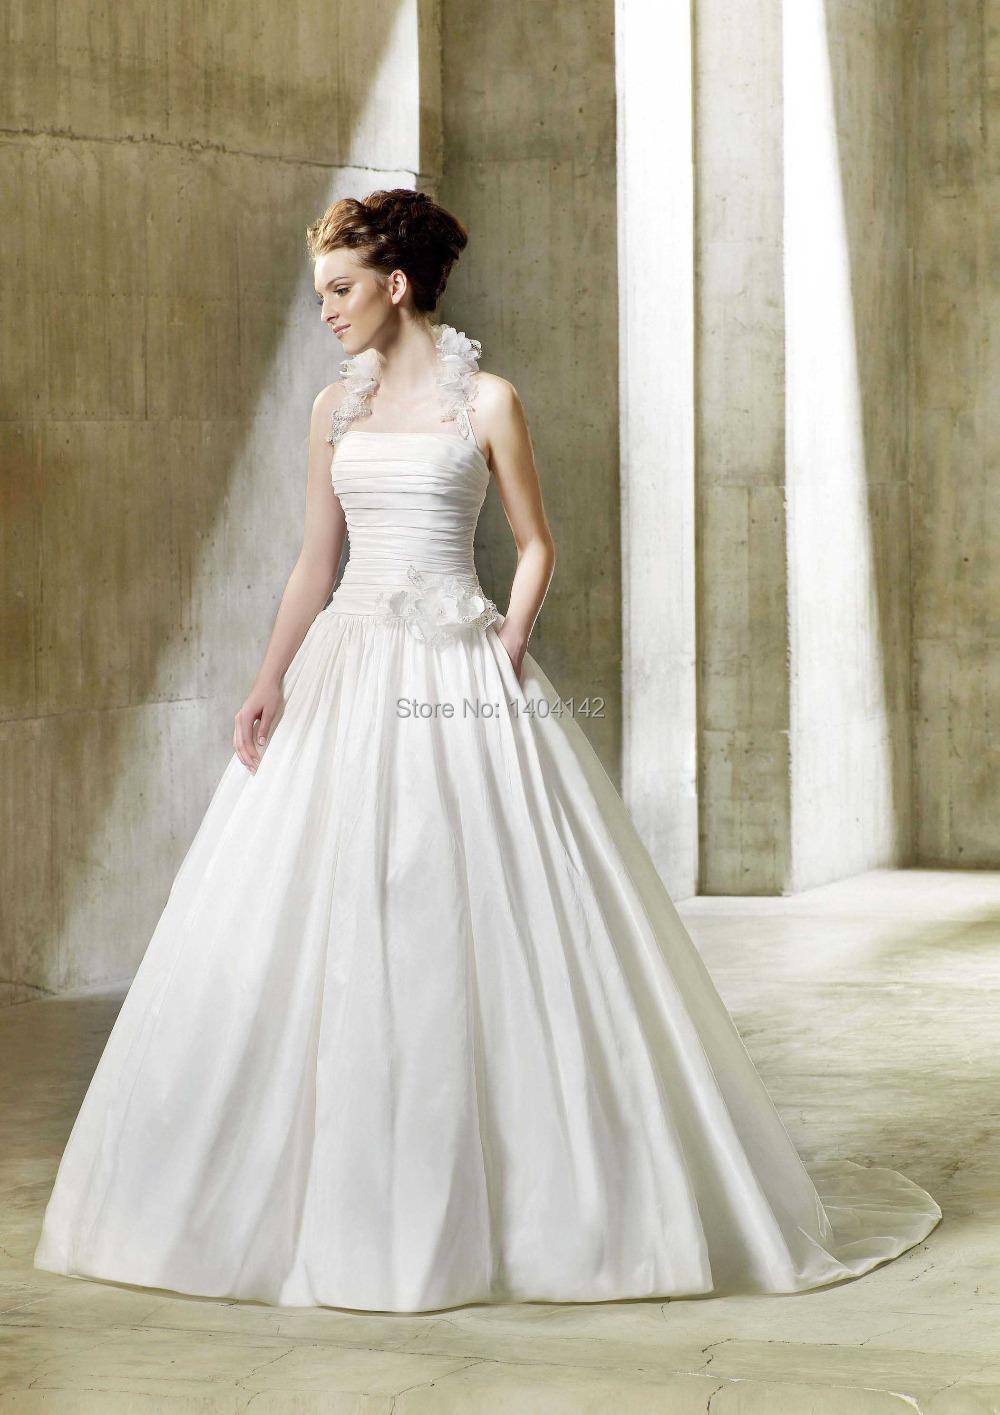 New design a line bridal wedding dress simple halter for Plain a line wedding dress